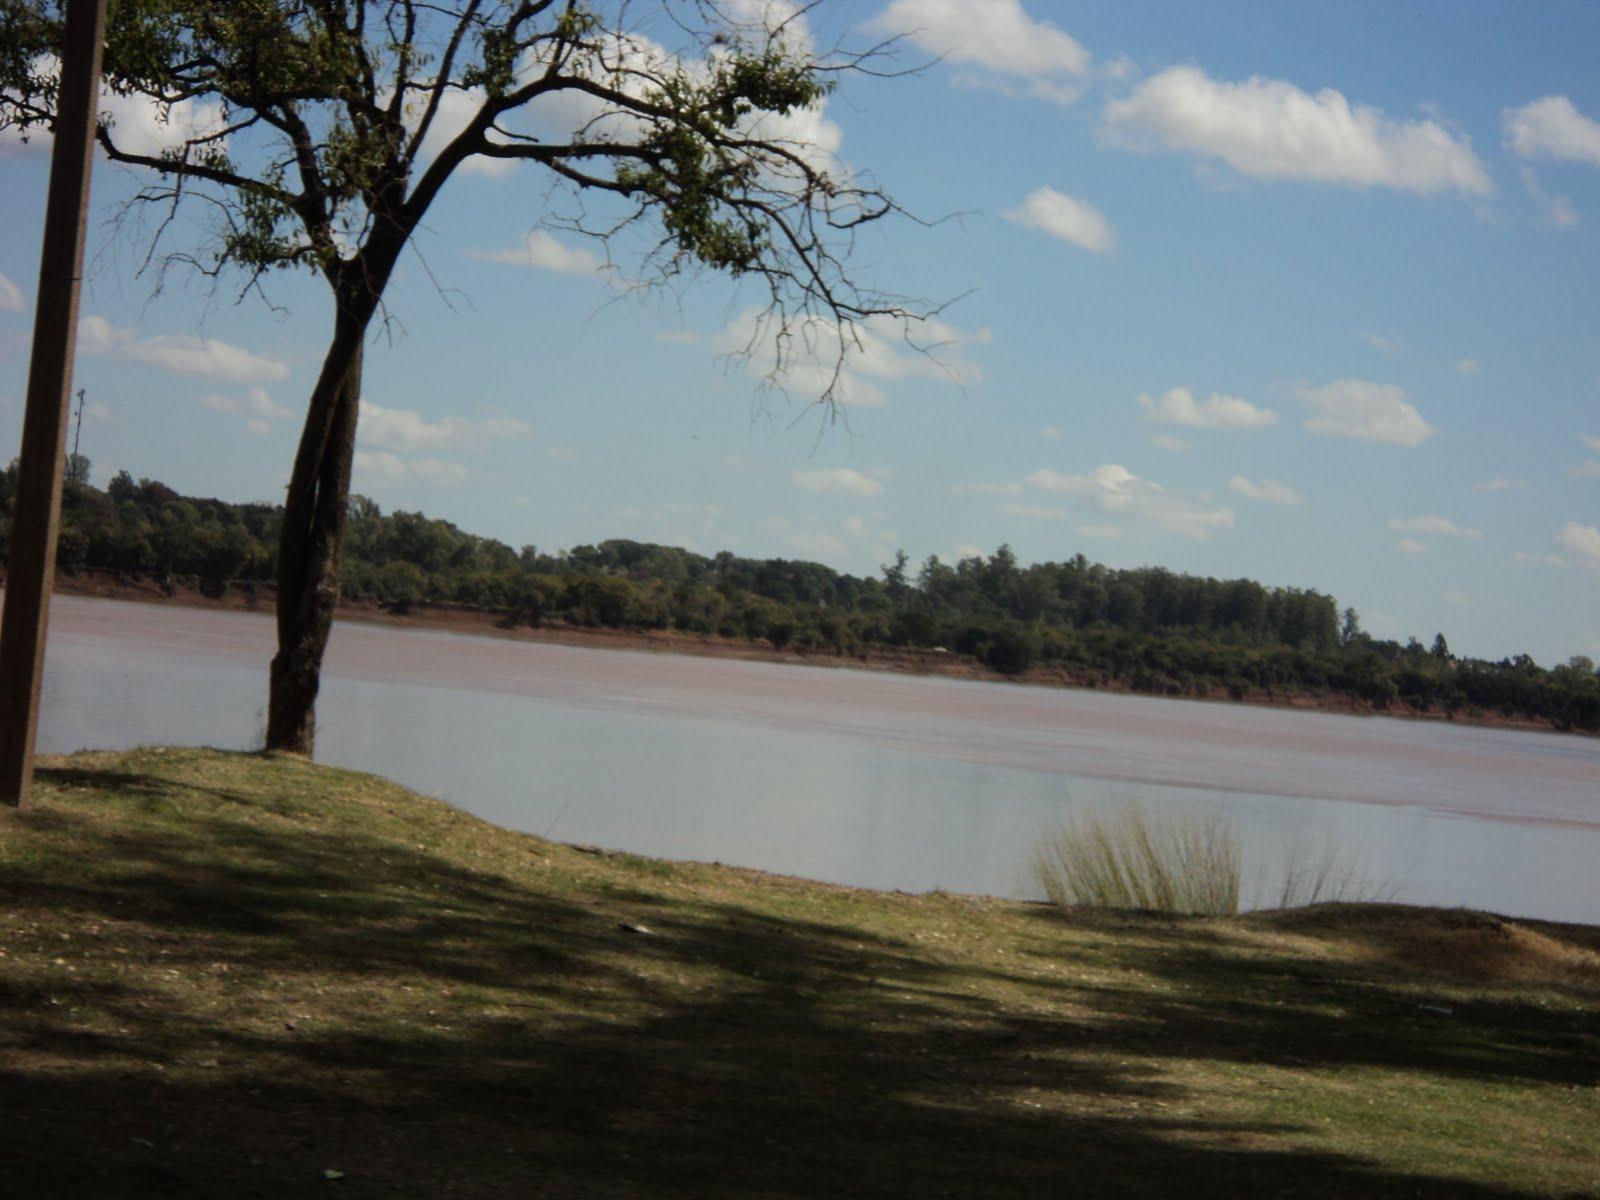 http://3.bp.blogspot.com/-pYjVv-NtF9w/TbTFwOn3yqI/AAAAAAAAAjw/16Guc99JUok/s1600/River+in+Salto2.JPG